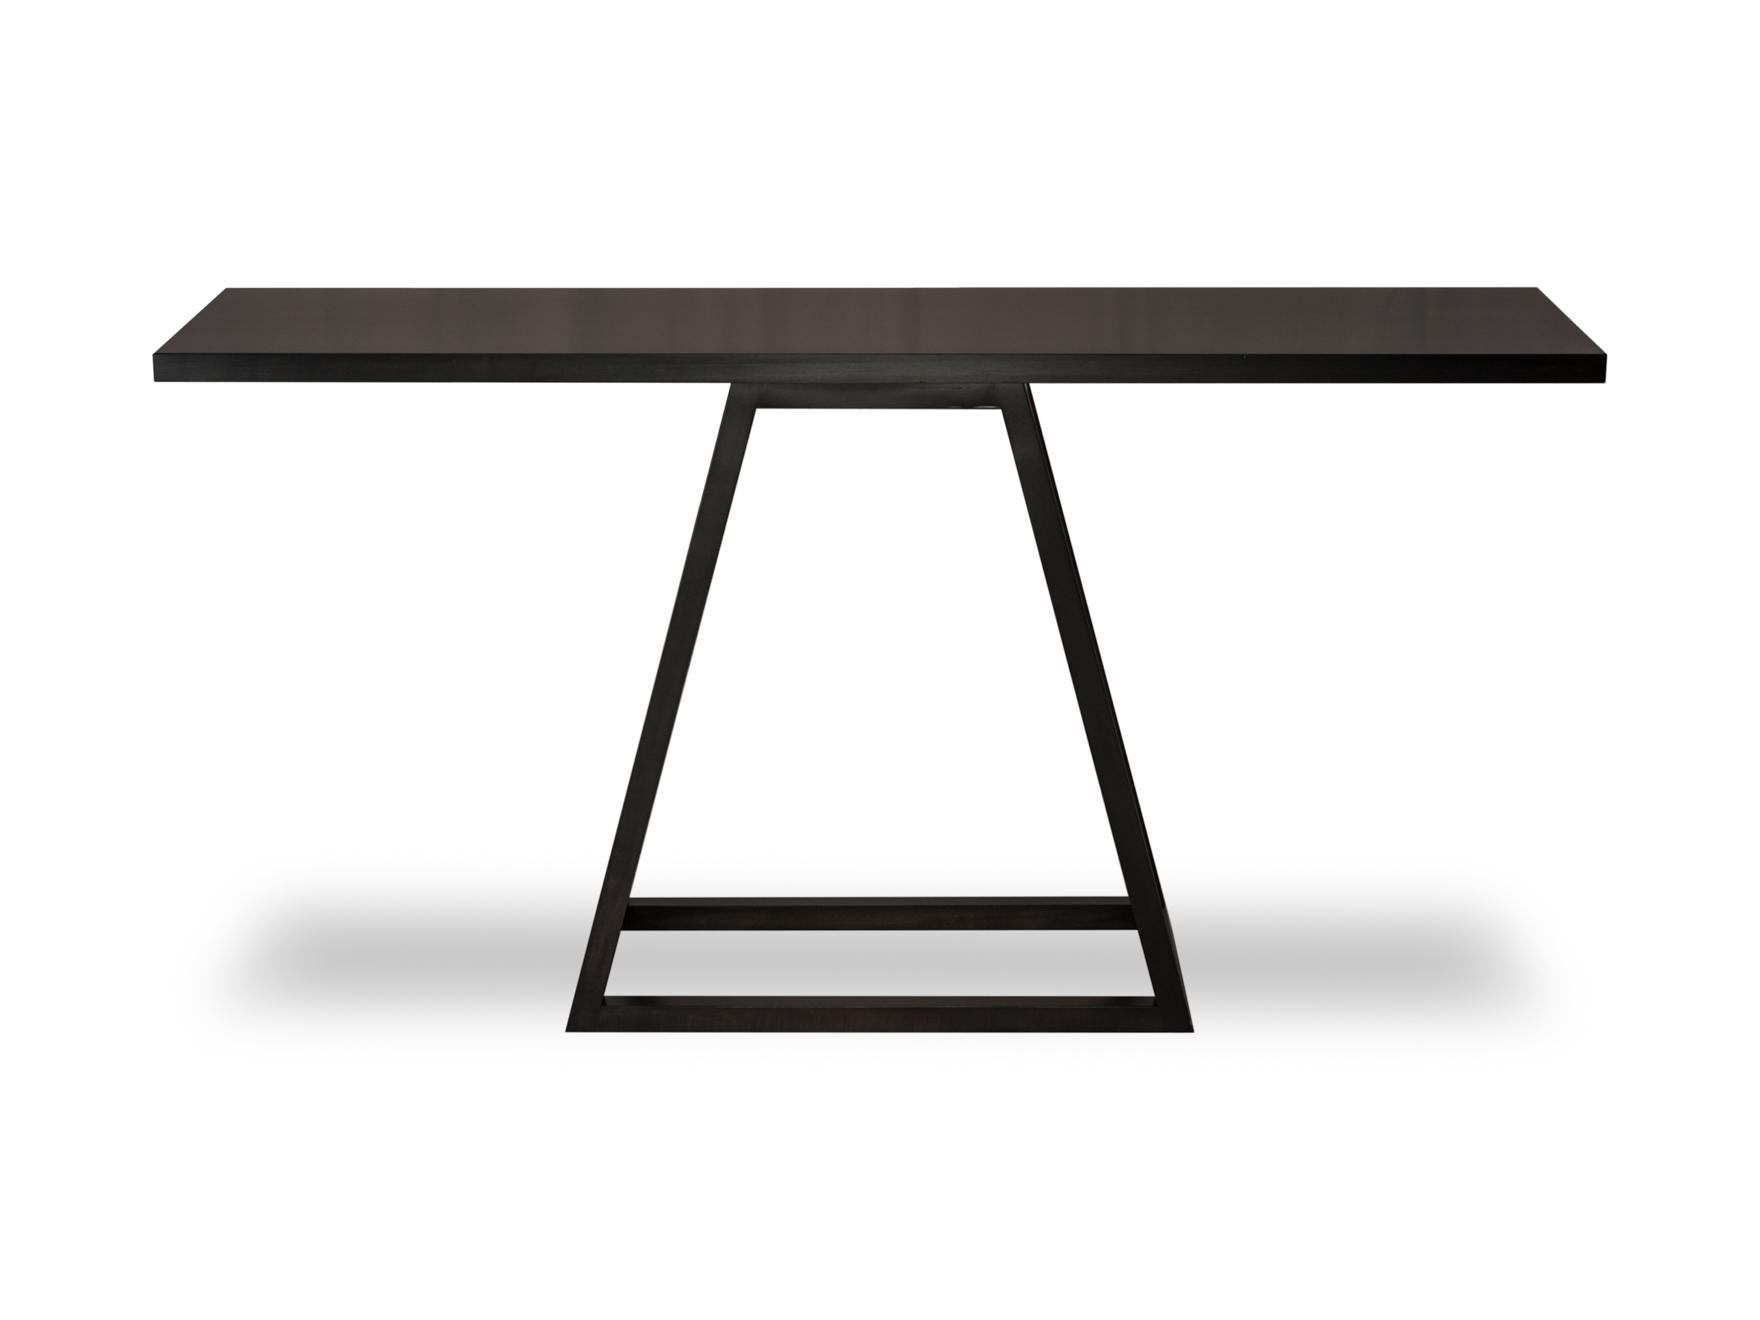 005_Woodcraft_Furniture_AvenueSofaTable_FrontA-1.jpg